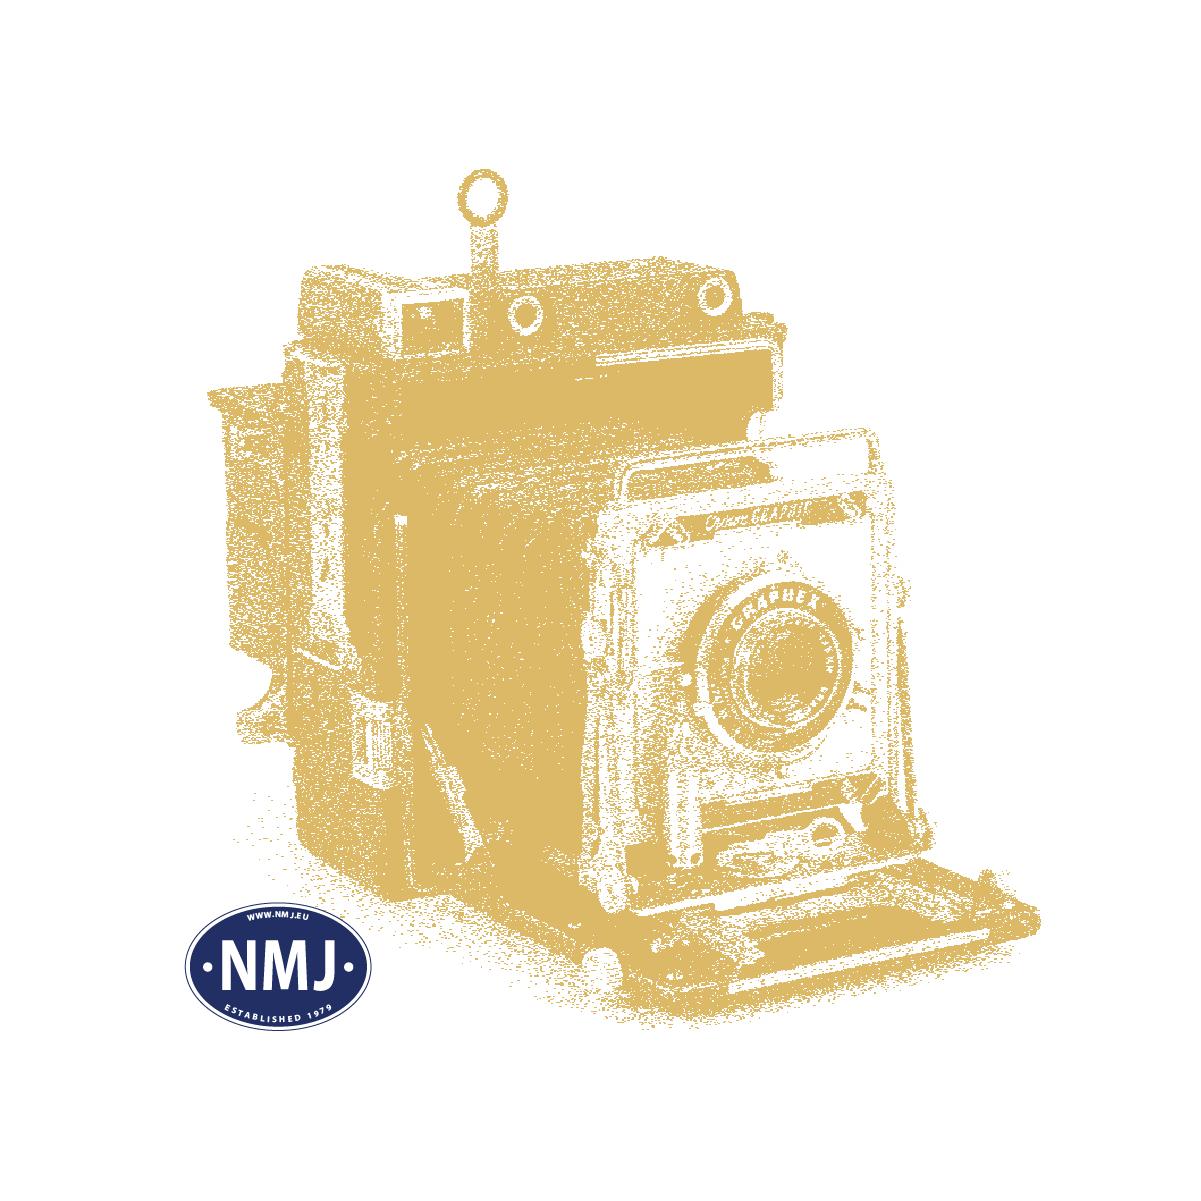 WODJP5612 - N City Classic, Just Plug, Funksjonsmodell m/ lys